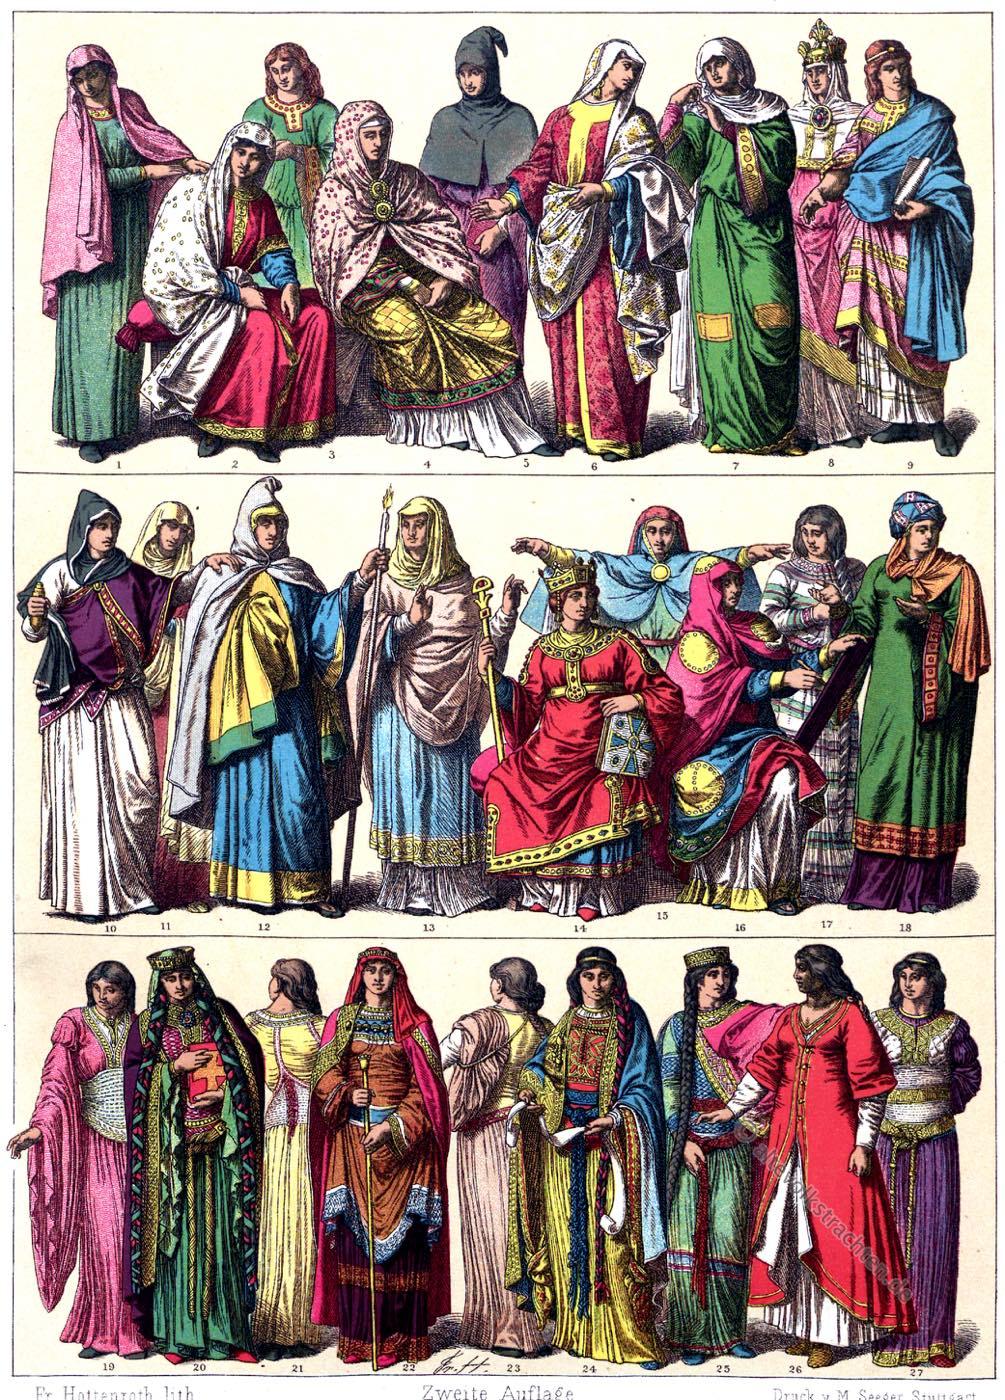 Gewandung, Karolinger, Kapetinger, Mittelalter, Gotik, Kostüme, Mode, Frankreich,